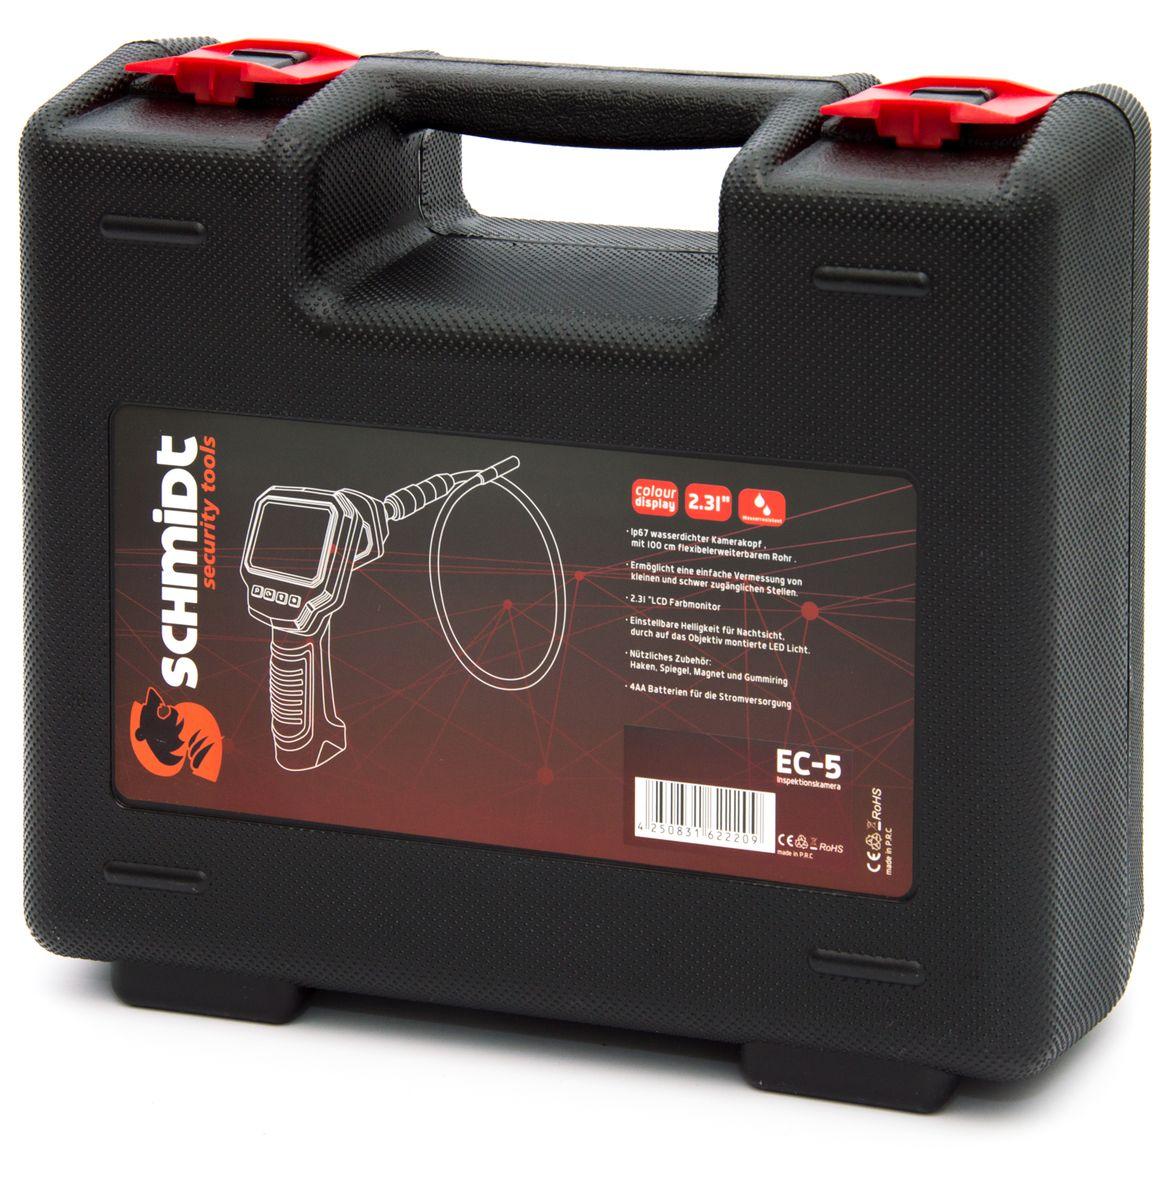 schmidt security tools inspektionskamera endoskop ec 5 mit lcd farb monitor mit sd. Black Bedroom Furniture Sets. Home Design Ideas